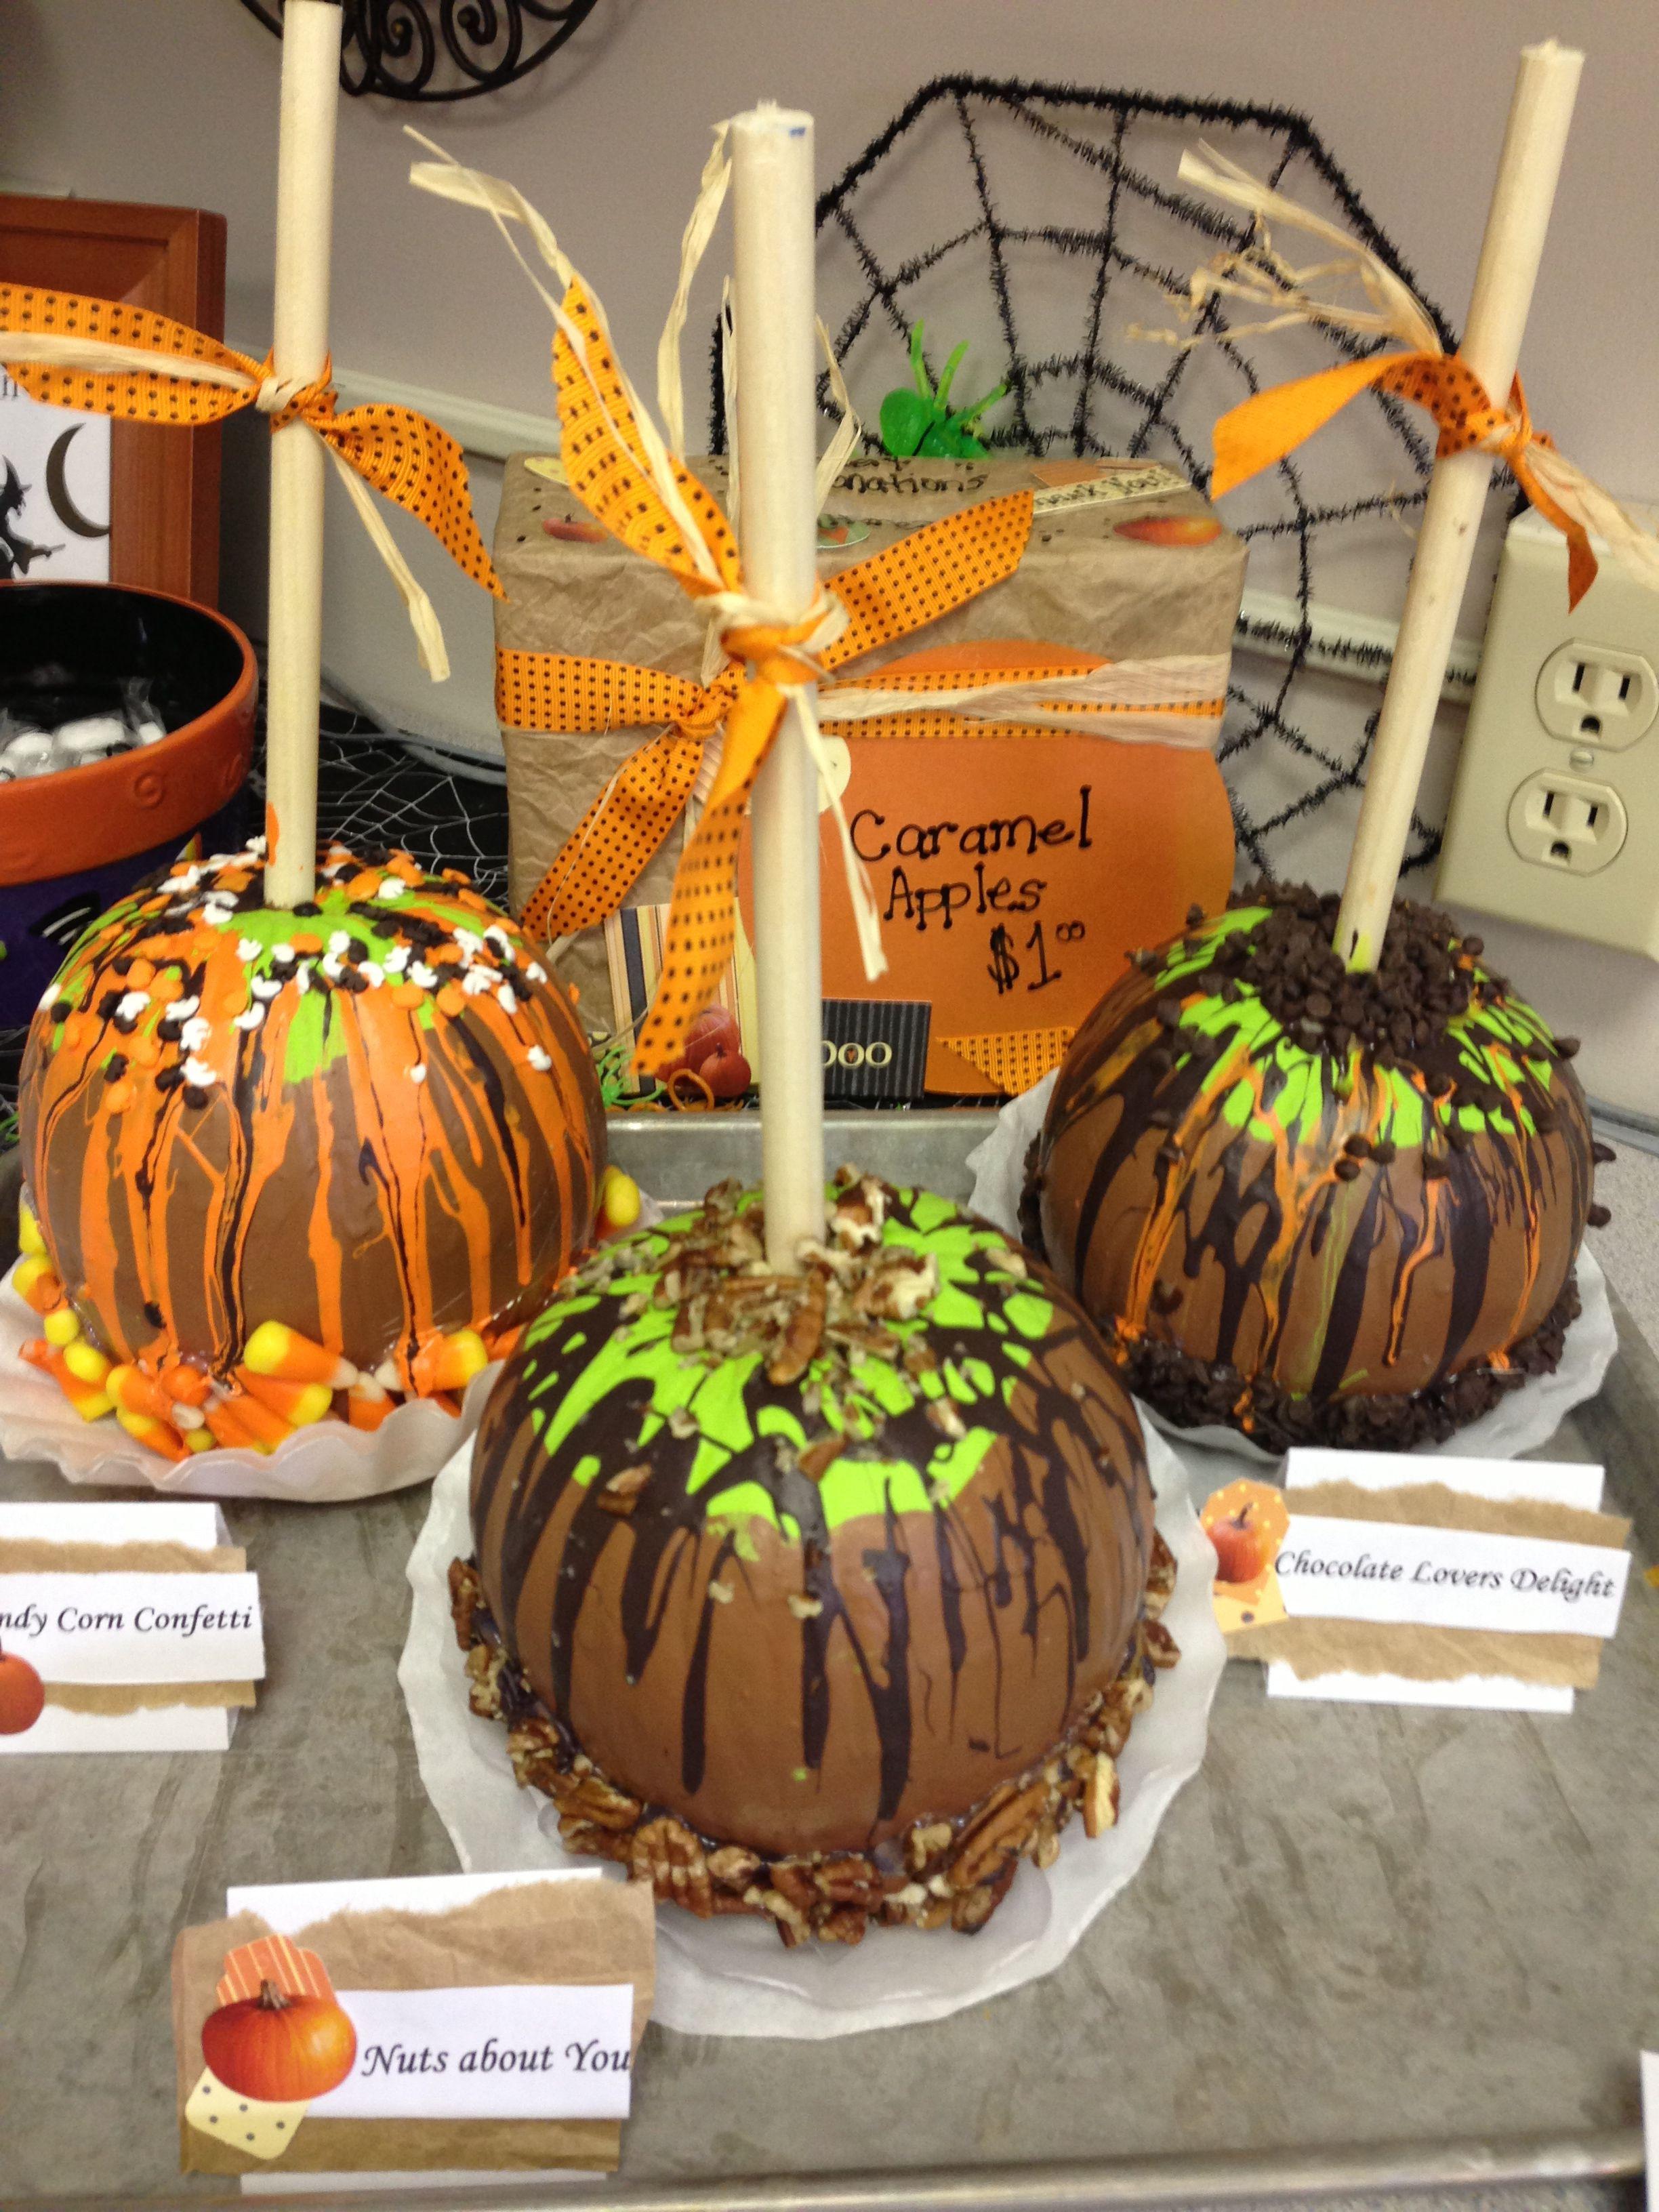 Halloween Caramel Apples Ideas  Caramel apple pumpkins I made for the pumpkin decorating